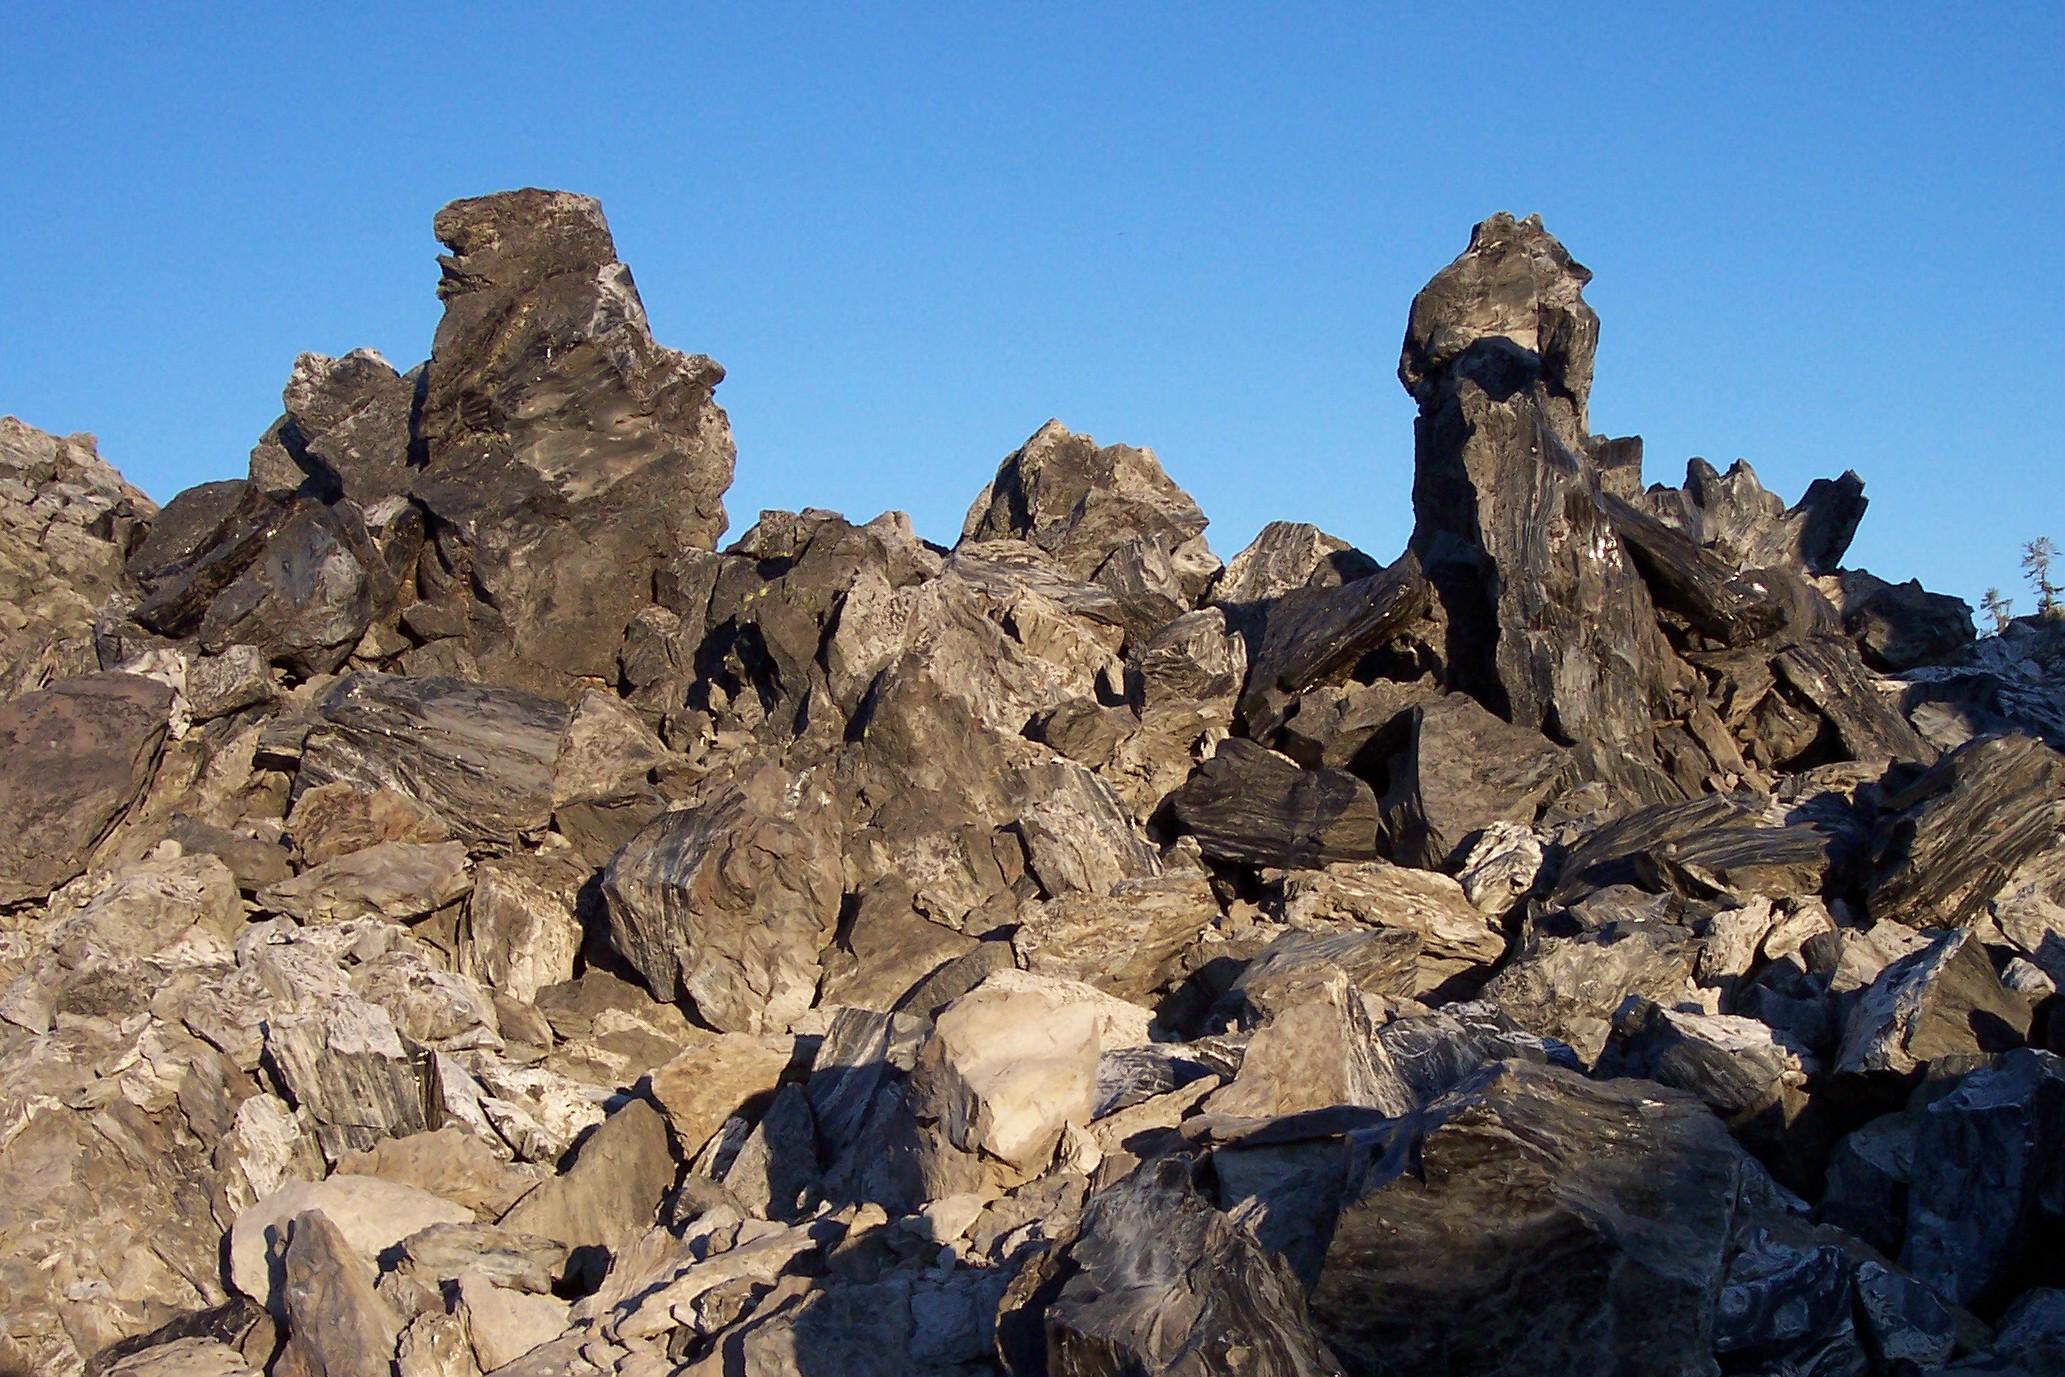 Modoc National Forest - Rocks & Minerals